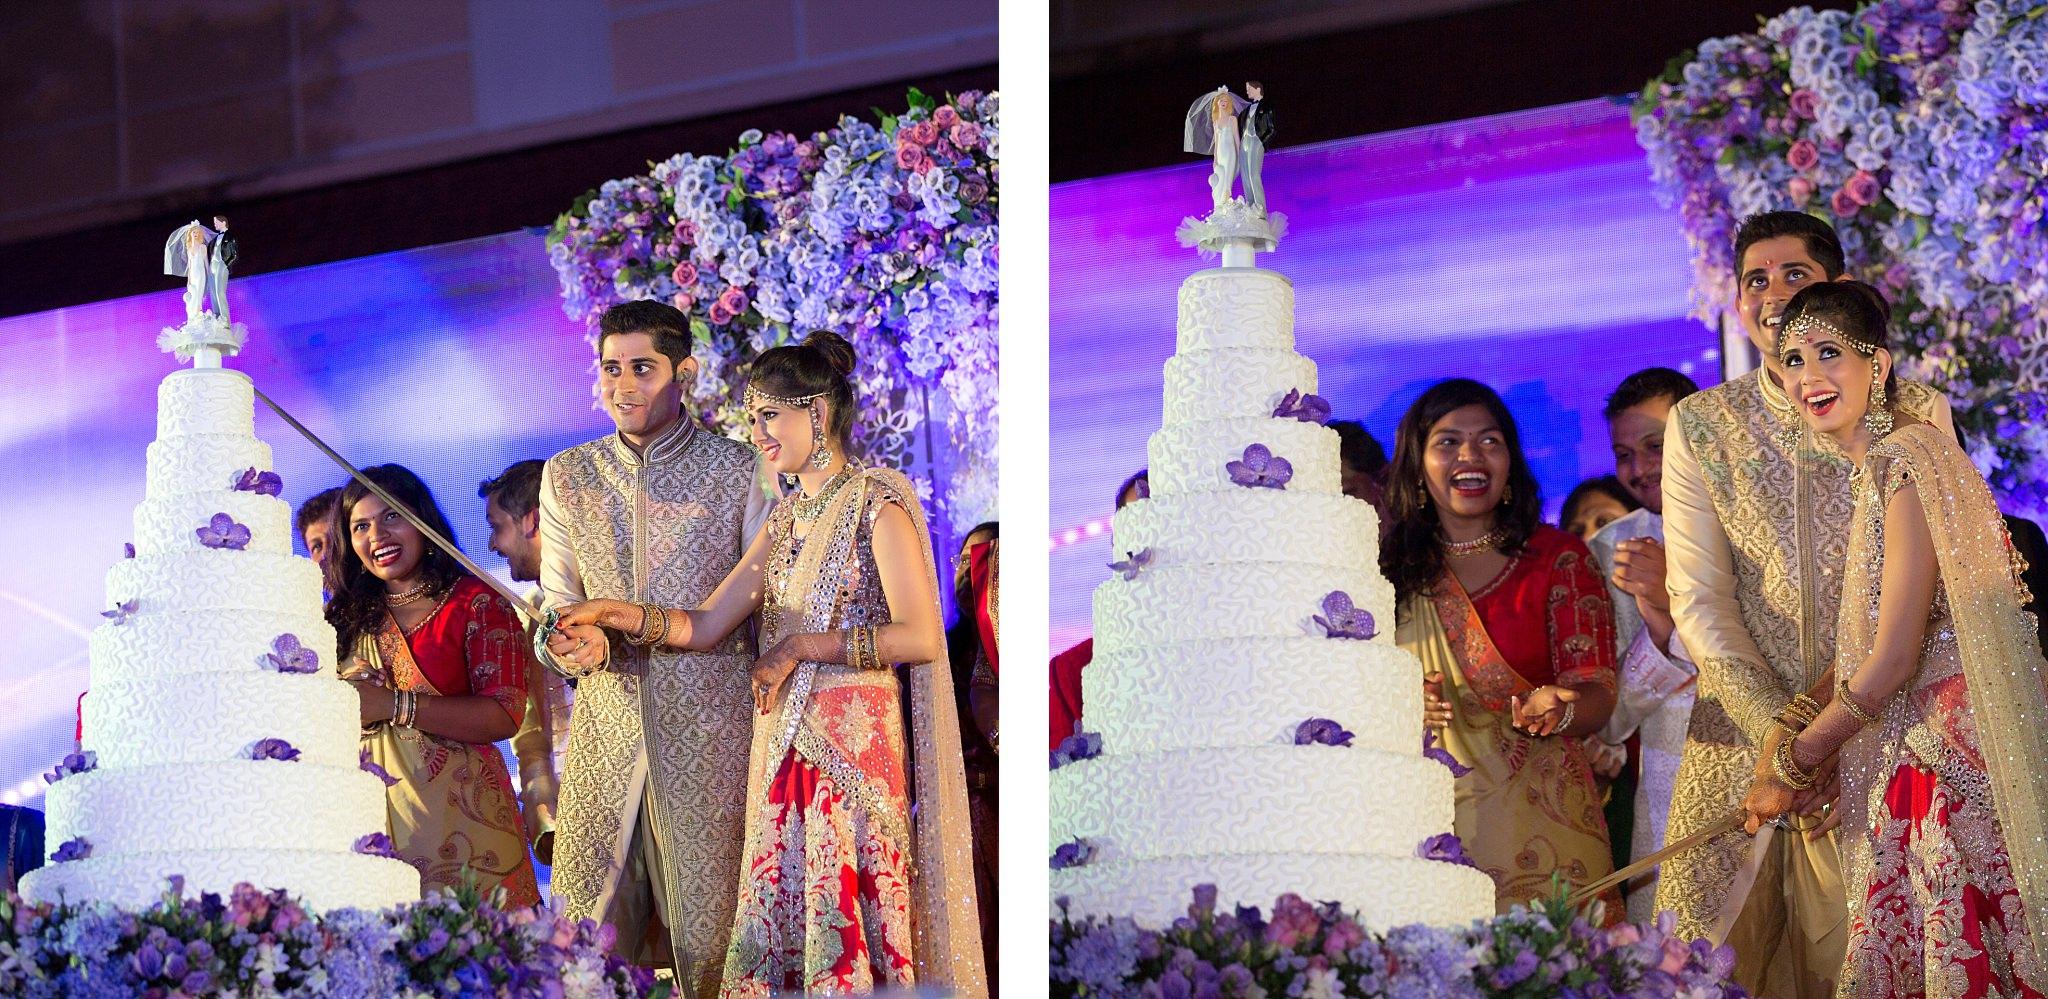 Dusit Thani Hua Hin Wedding_0113